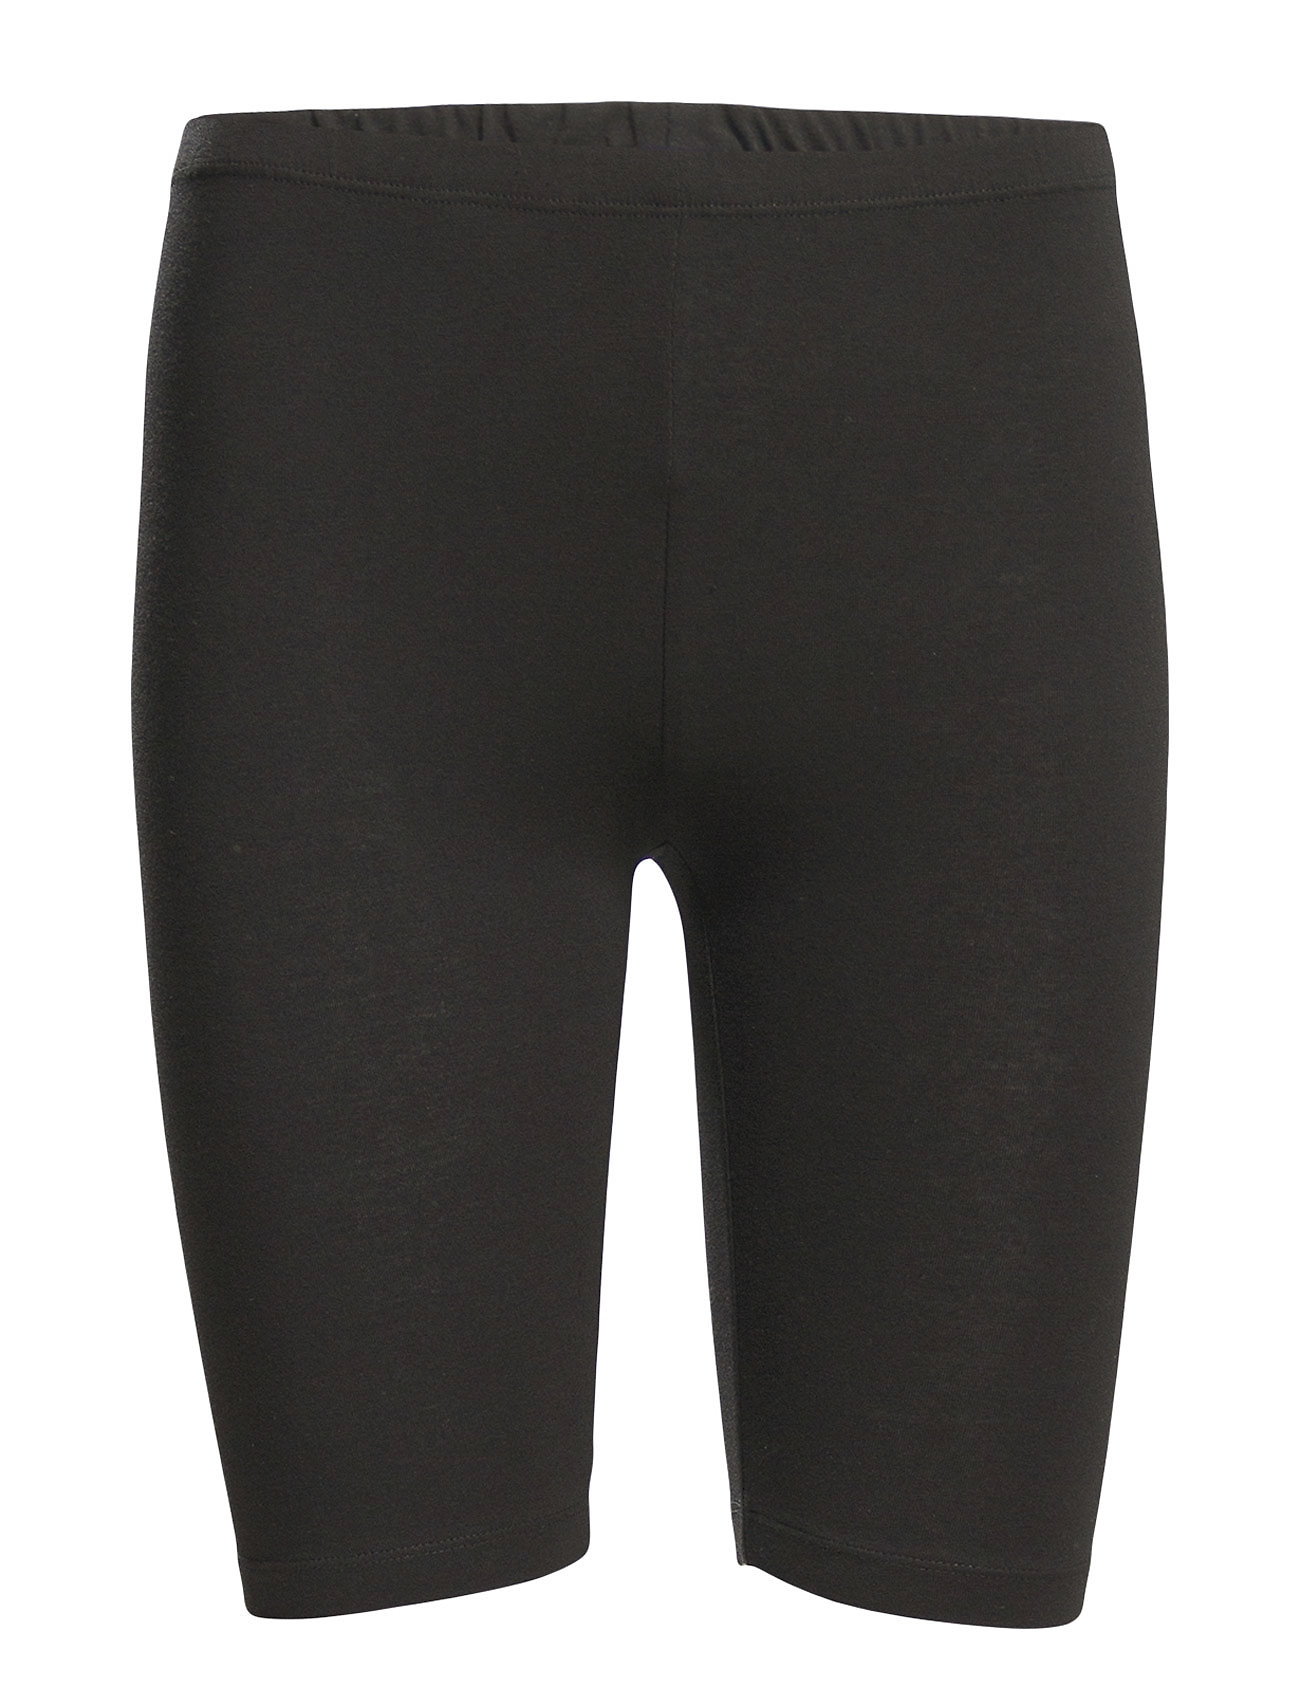 Decoy Dame shorts, Decoy - BLACK